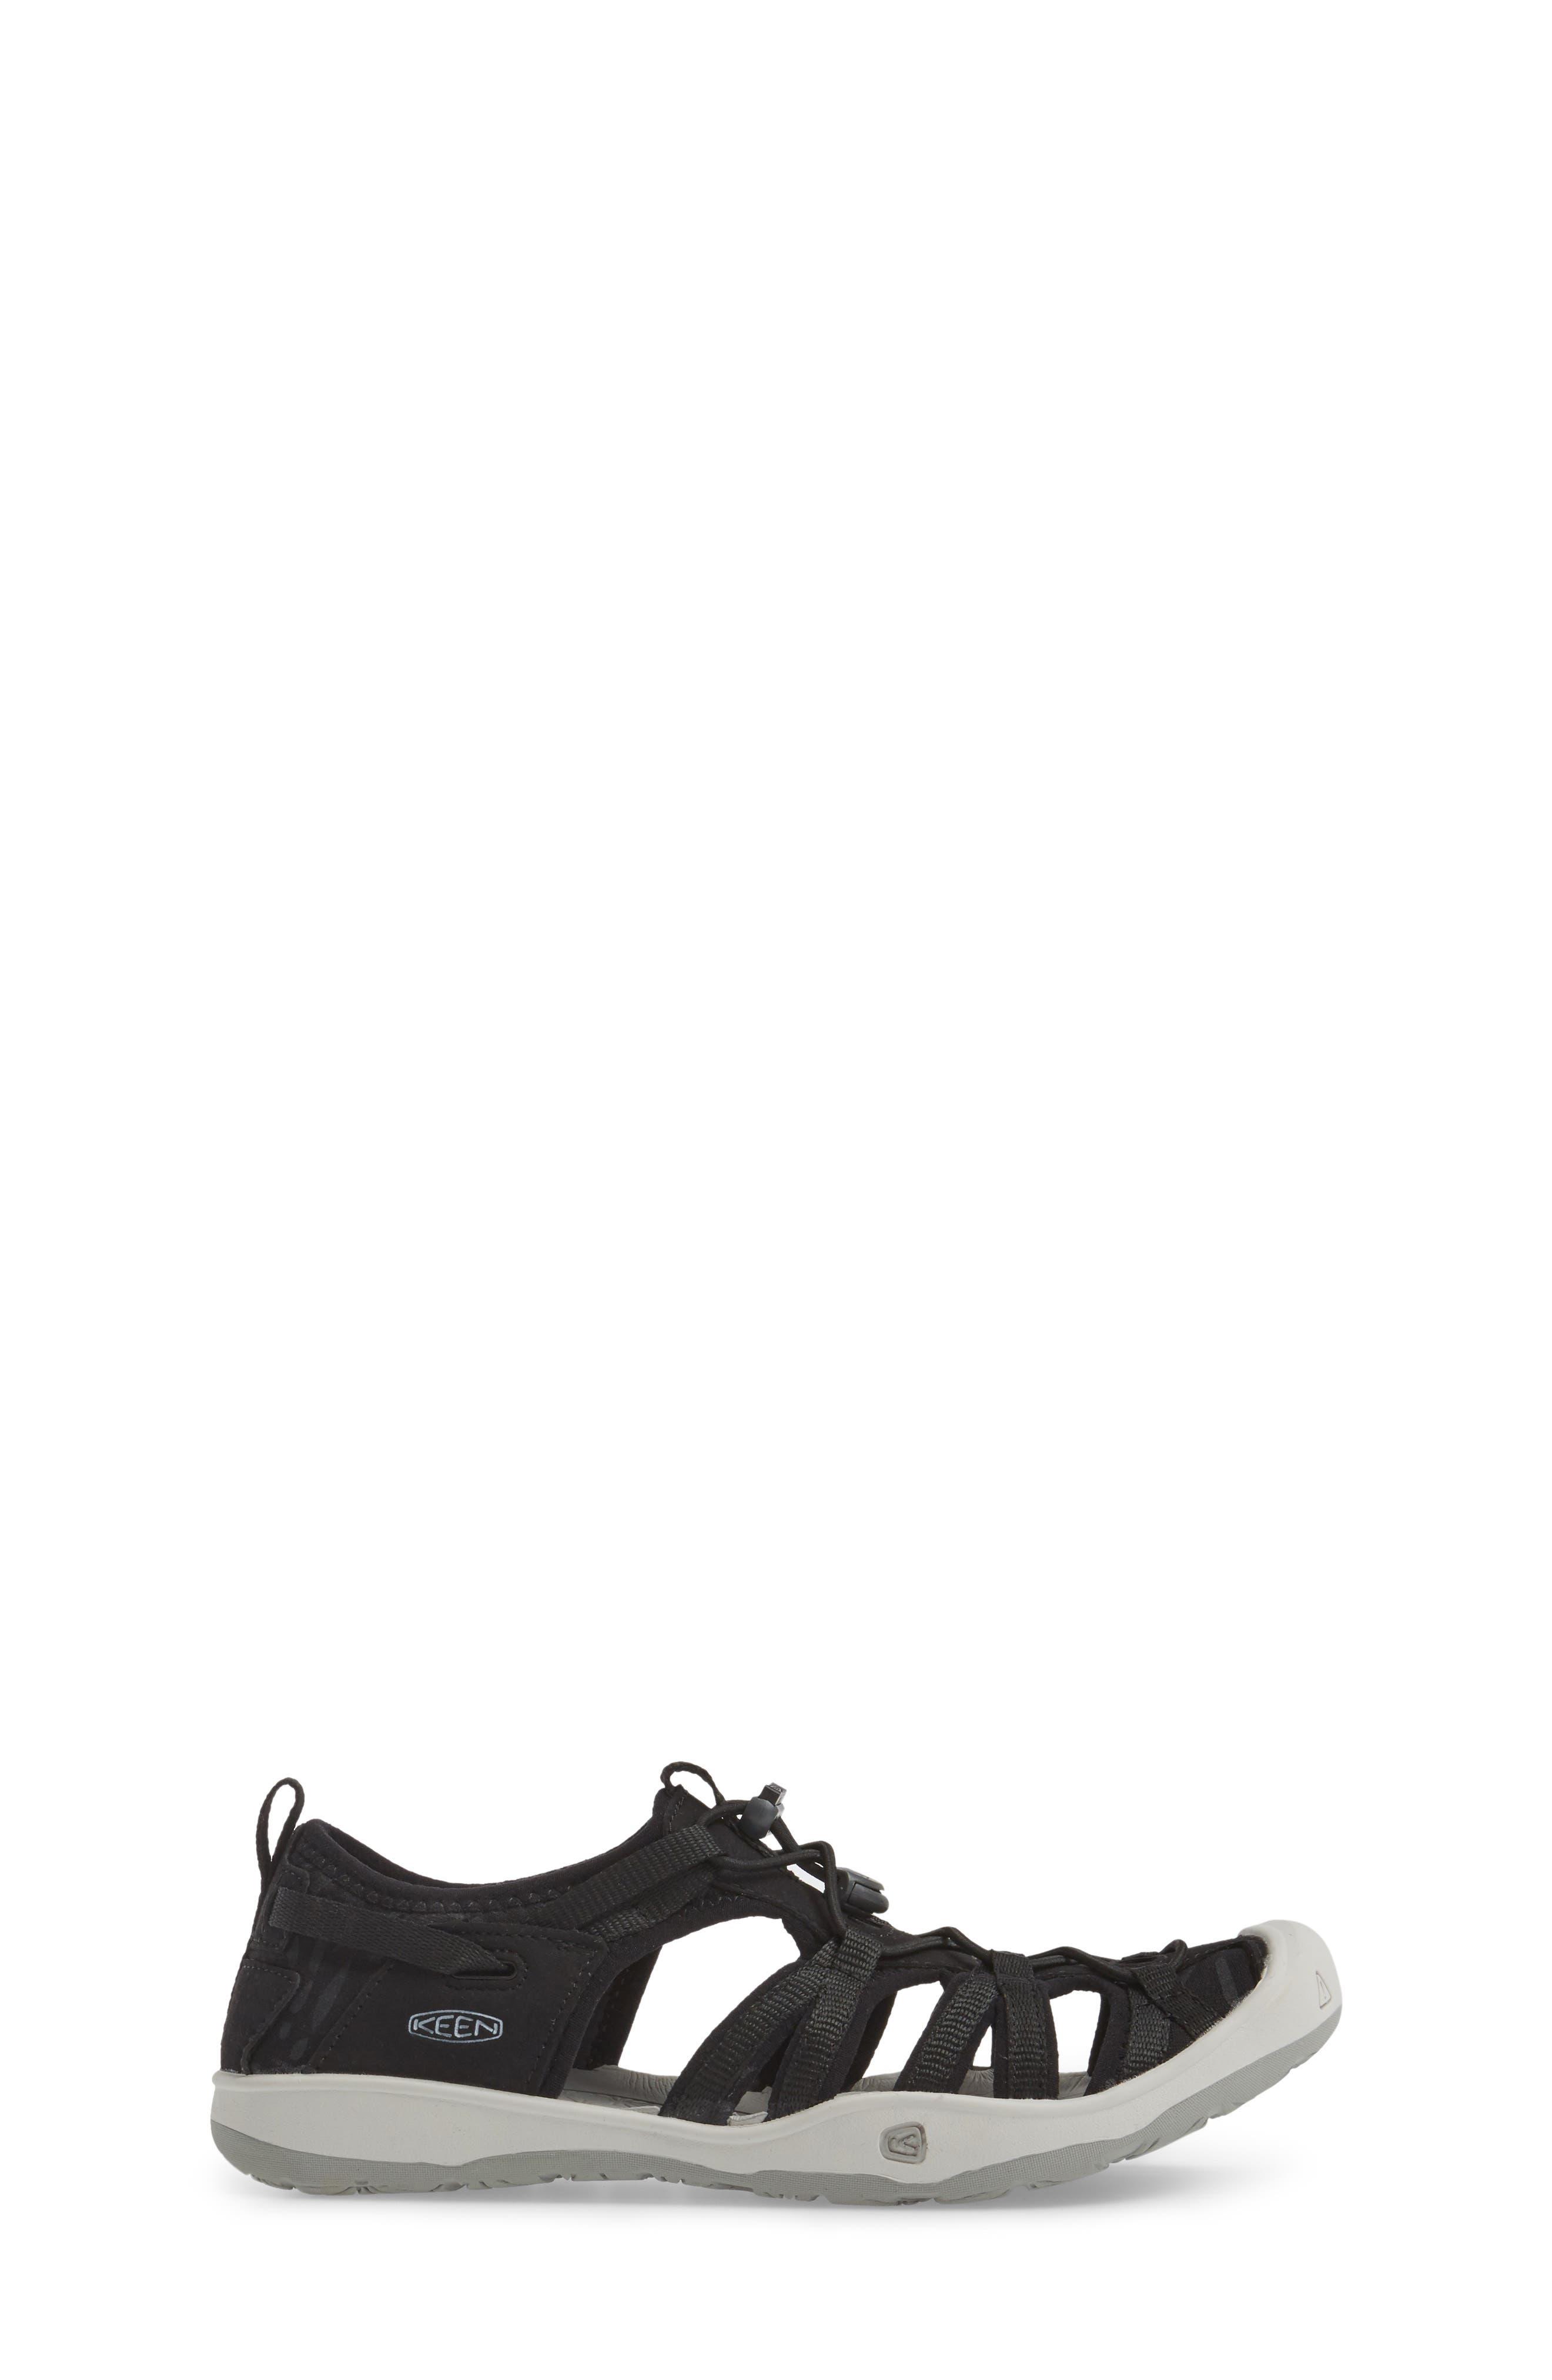 KEEN, Moxie Water Friendly Sandal, Alternate thumbnail 3, color, BLACK/ VAPOR